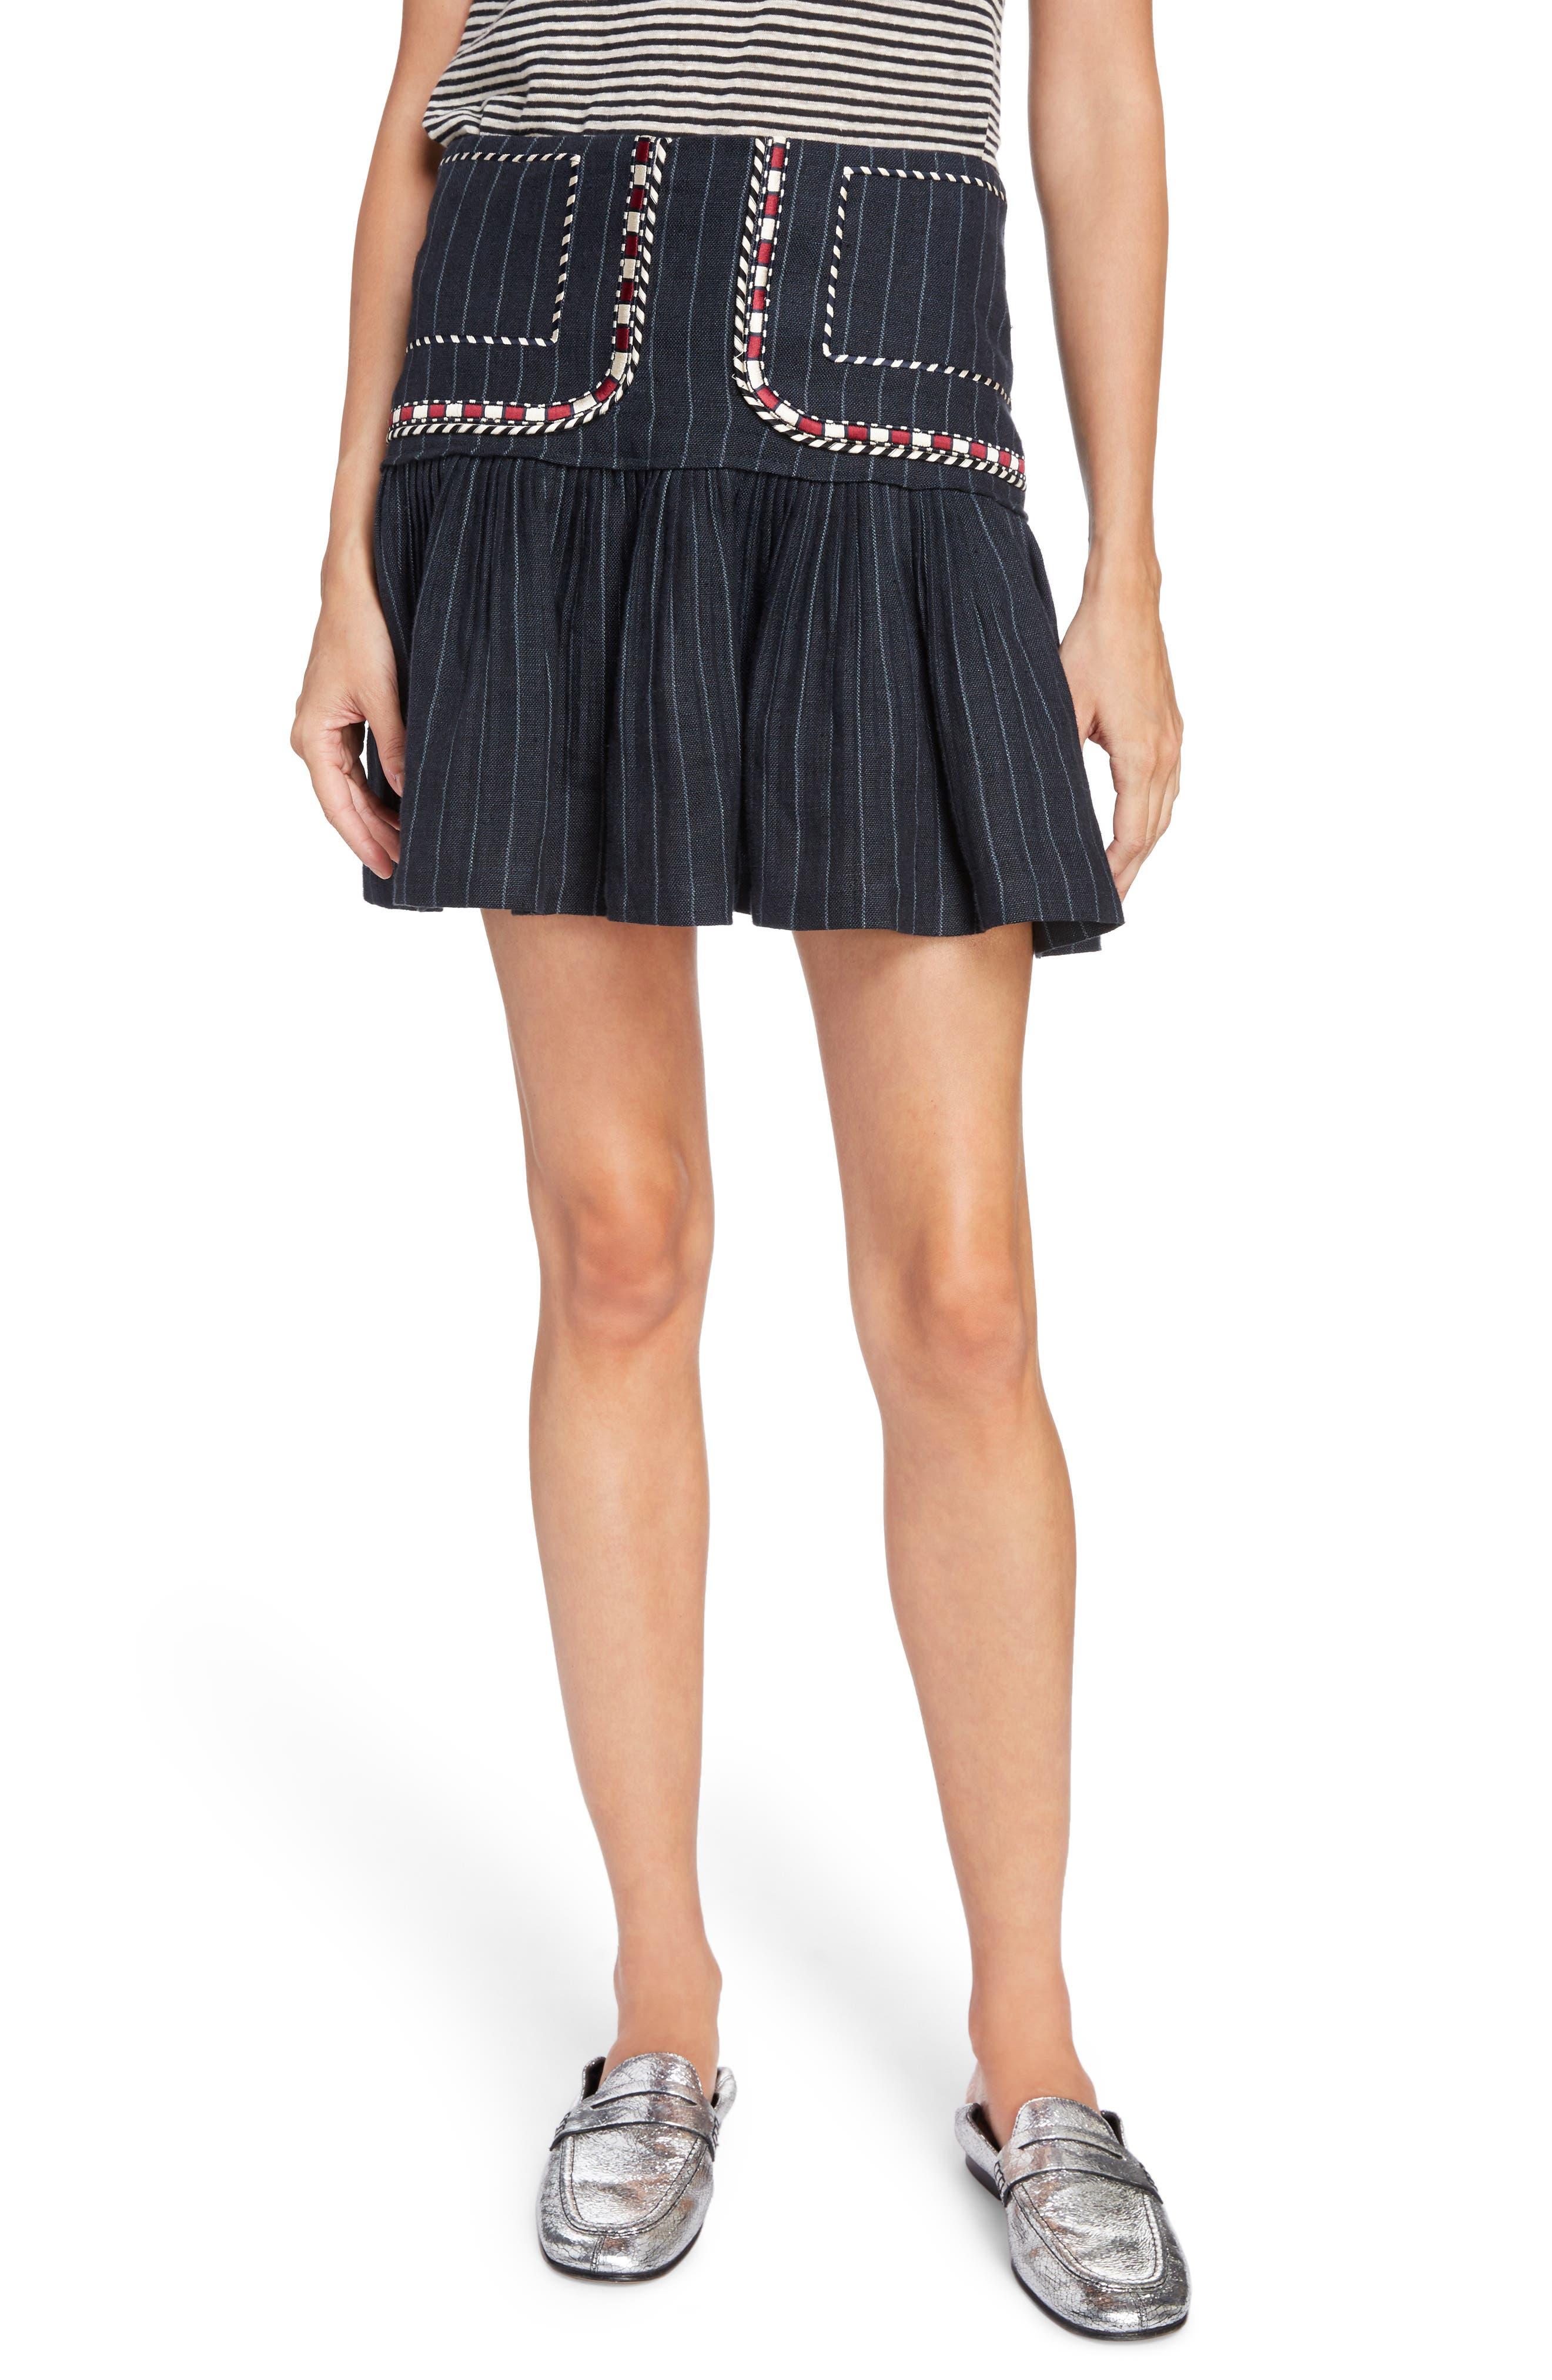 Alternate Image 1 Selected - Isabel Marant Étoile Jessie Embroidered Linen Skirt